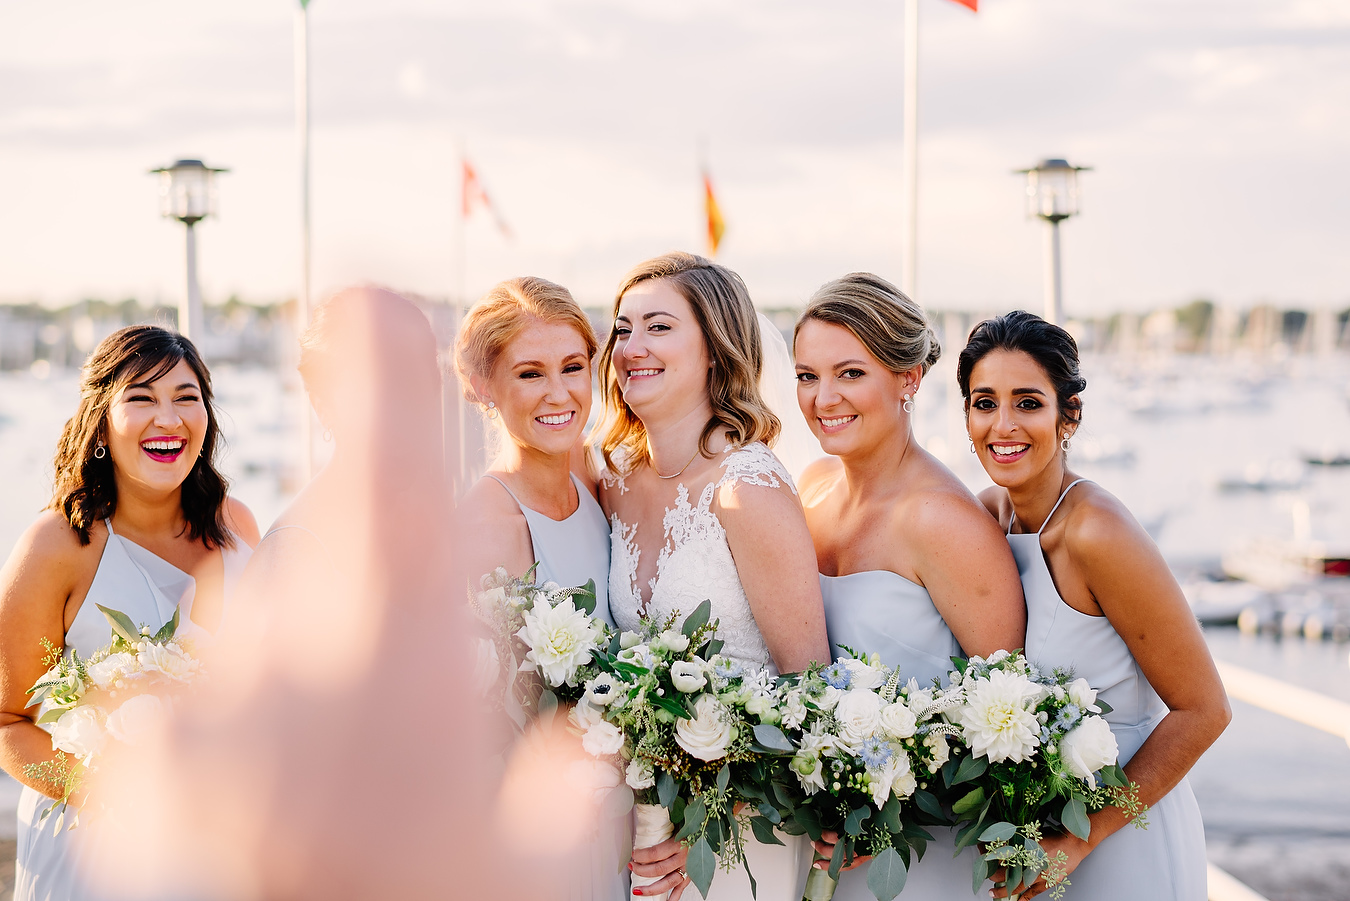 eastern_yacht_club_wedding_photos_marblehead_31.JPG